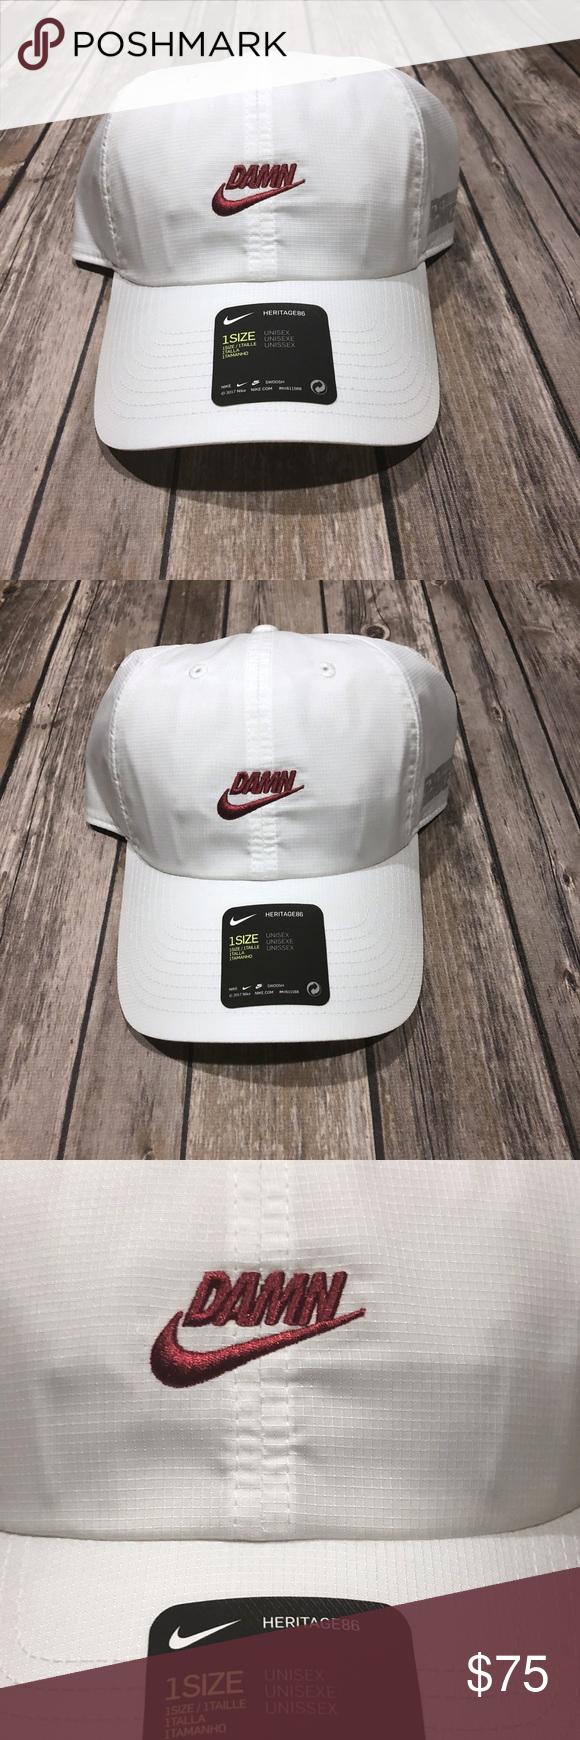 99db8844 Nike X Kendrick Lamar Limited Edition DAMN Hat Nike X Kendrick Lamar  Limited Edition DAMN Hat